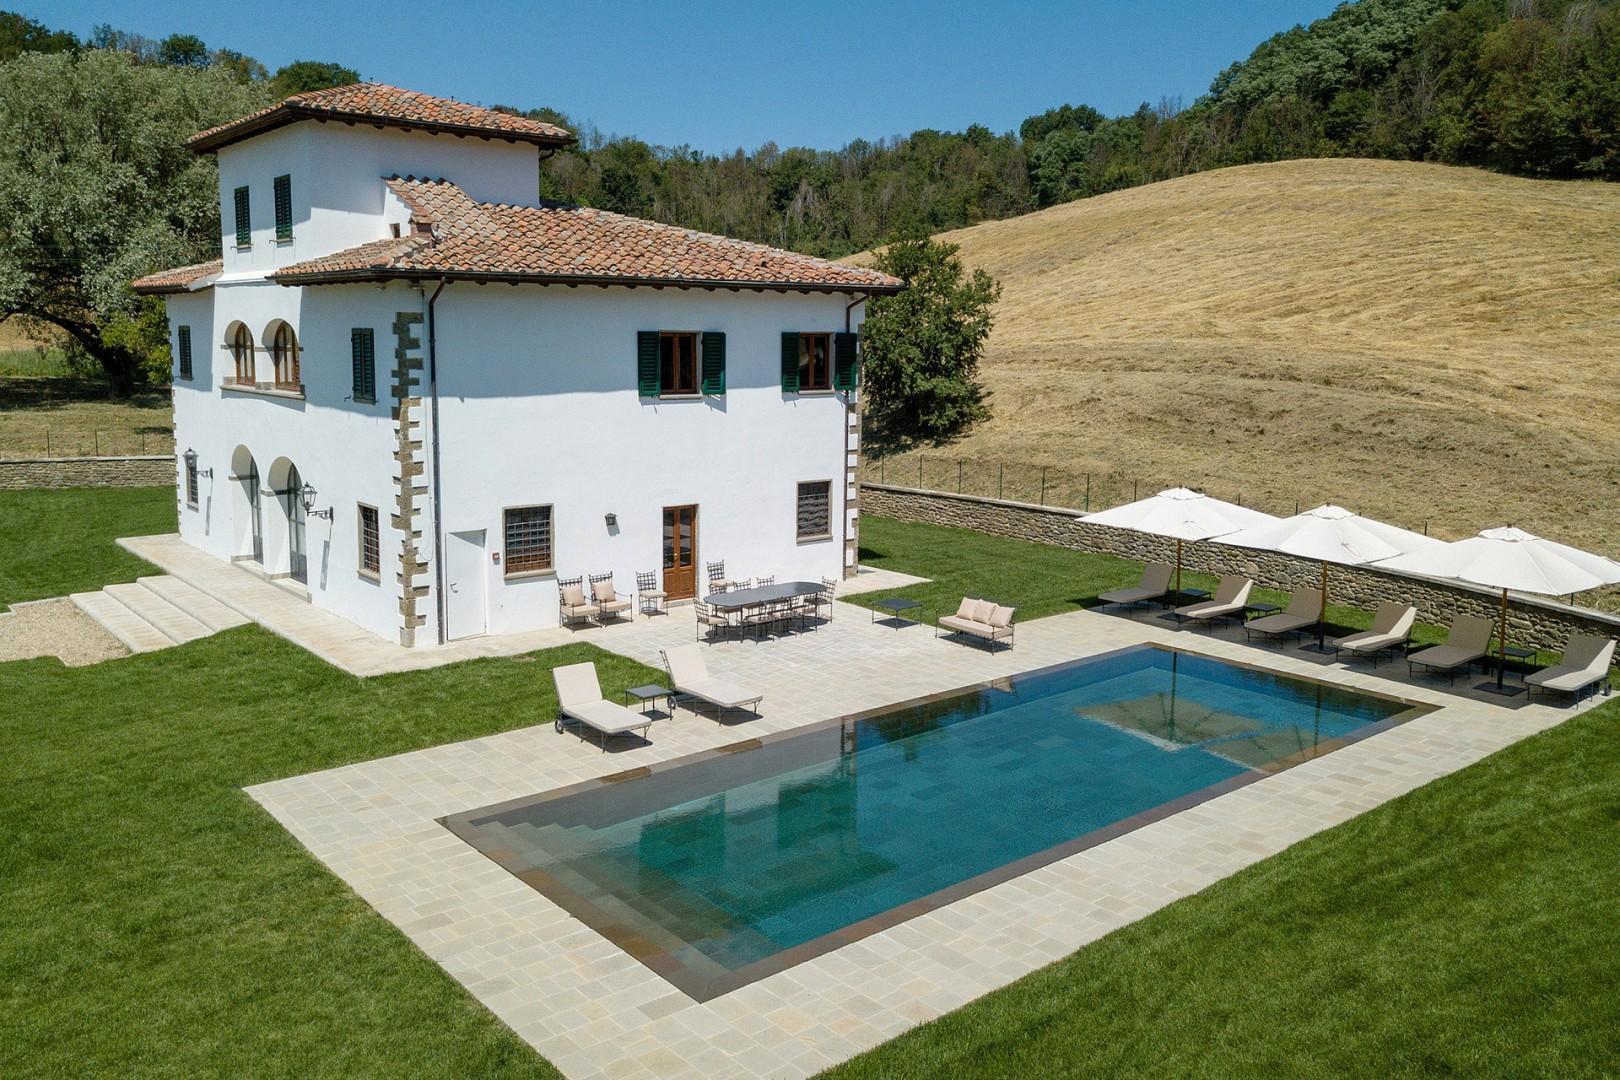 Take a dip in the Maragone villa's refreshing pool.